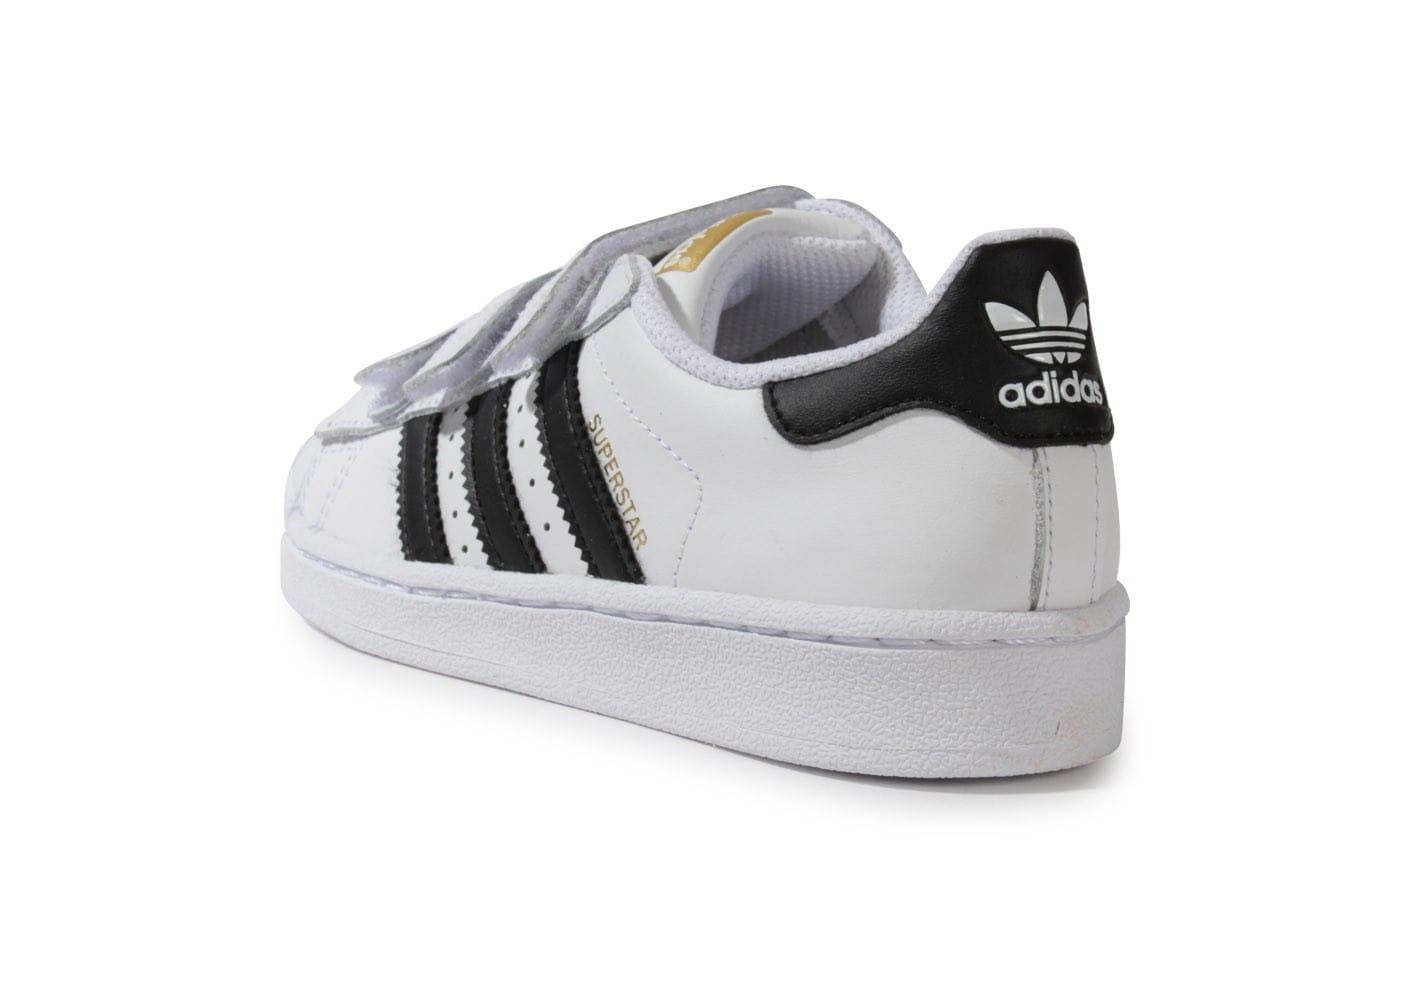 code promo c54f5 43c73 Xqipw4vt Superstar Homme Adidas Homme Adidas Superstar ...